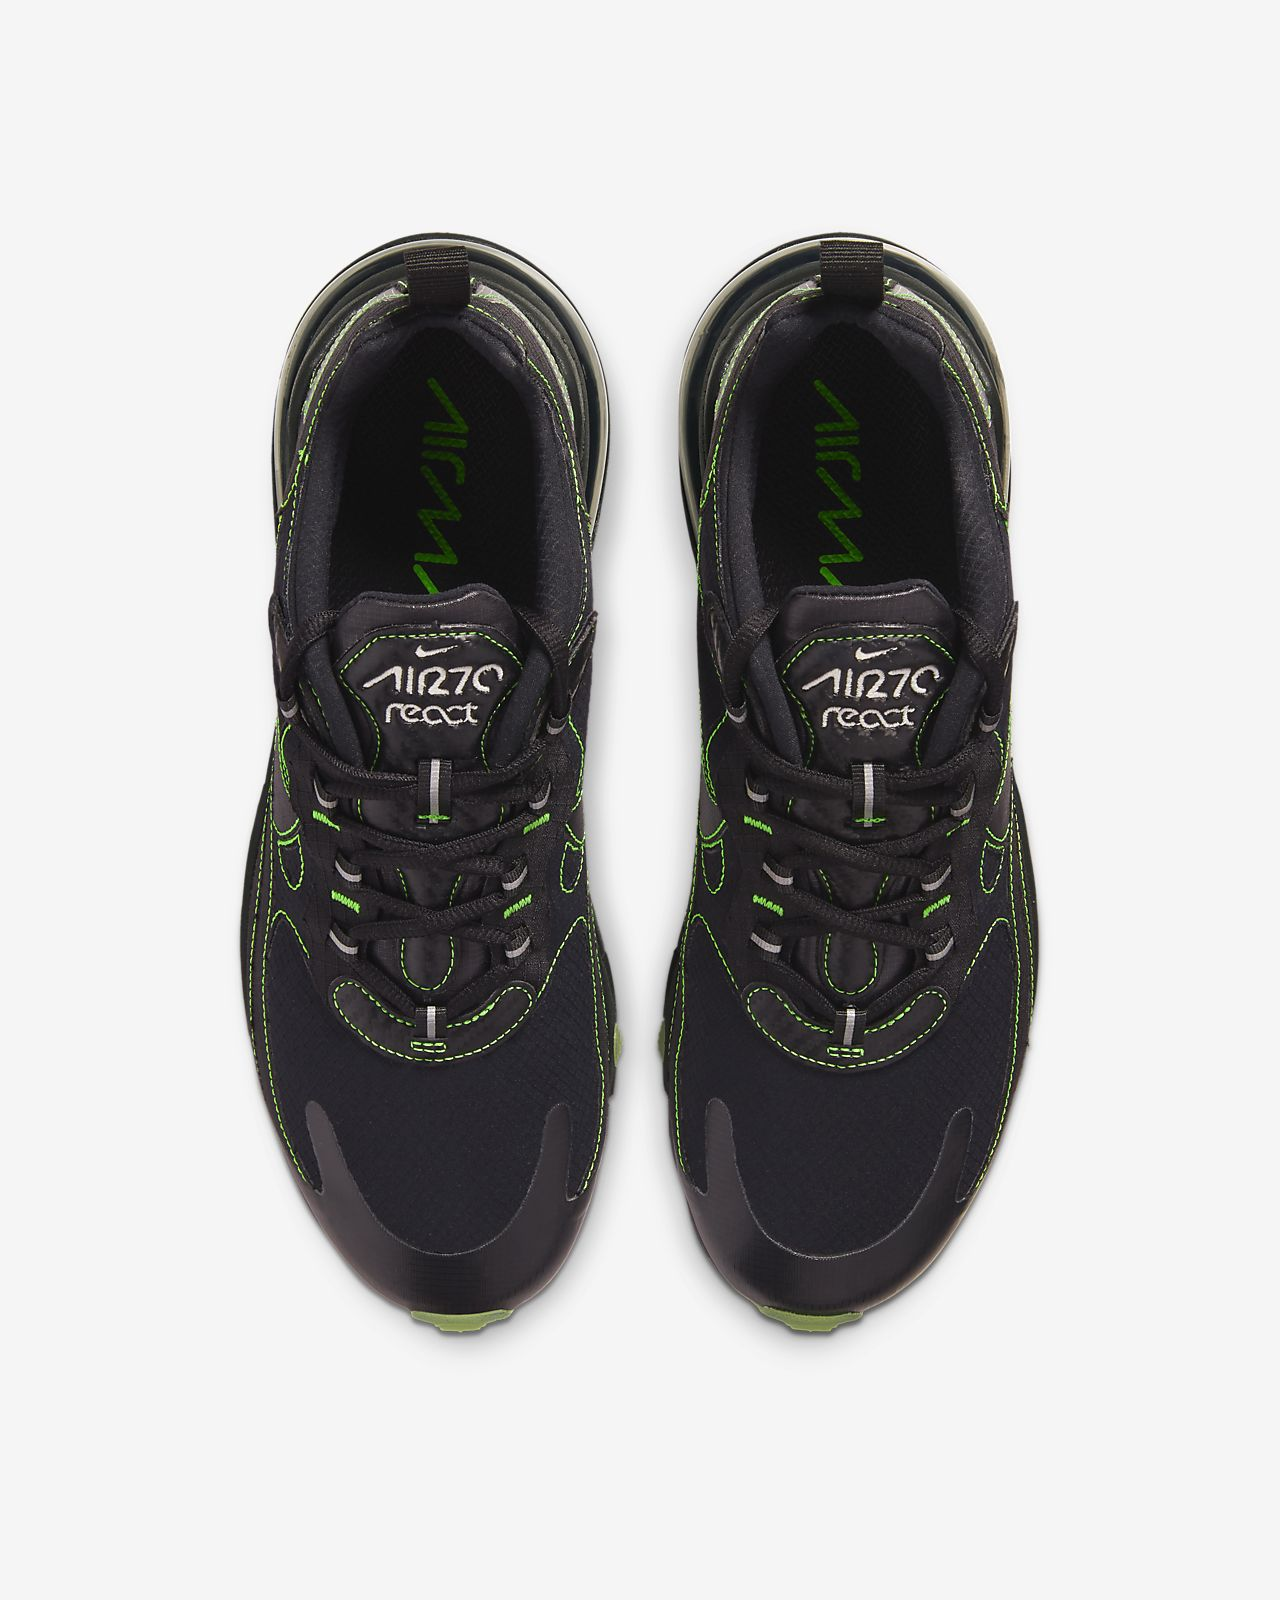 Nike Air Max 270 Special Edition Schuh